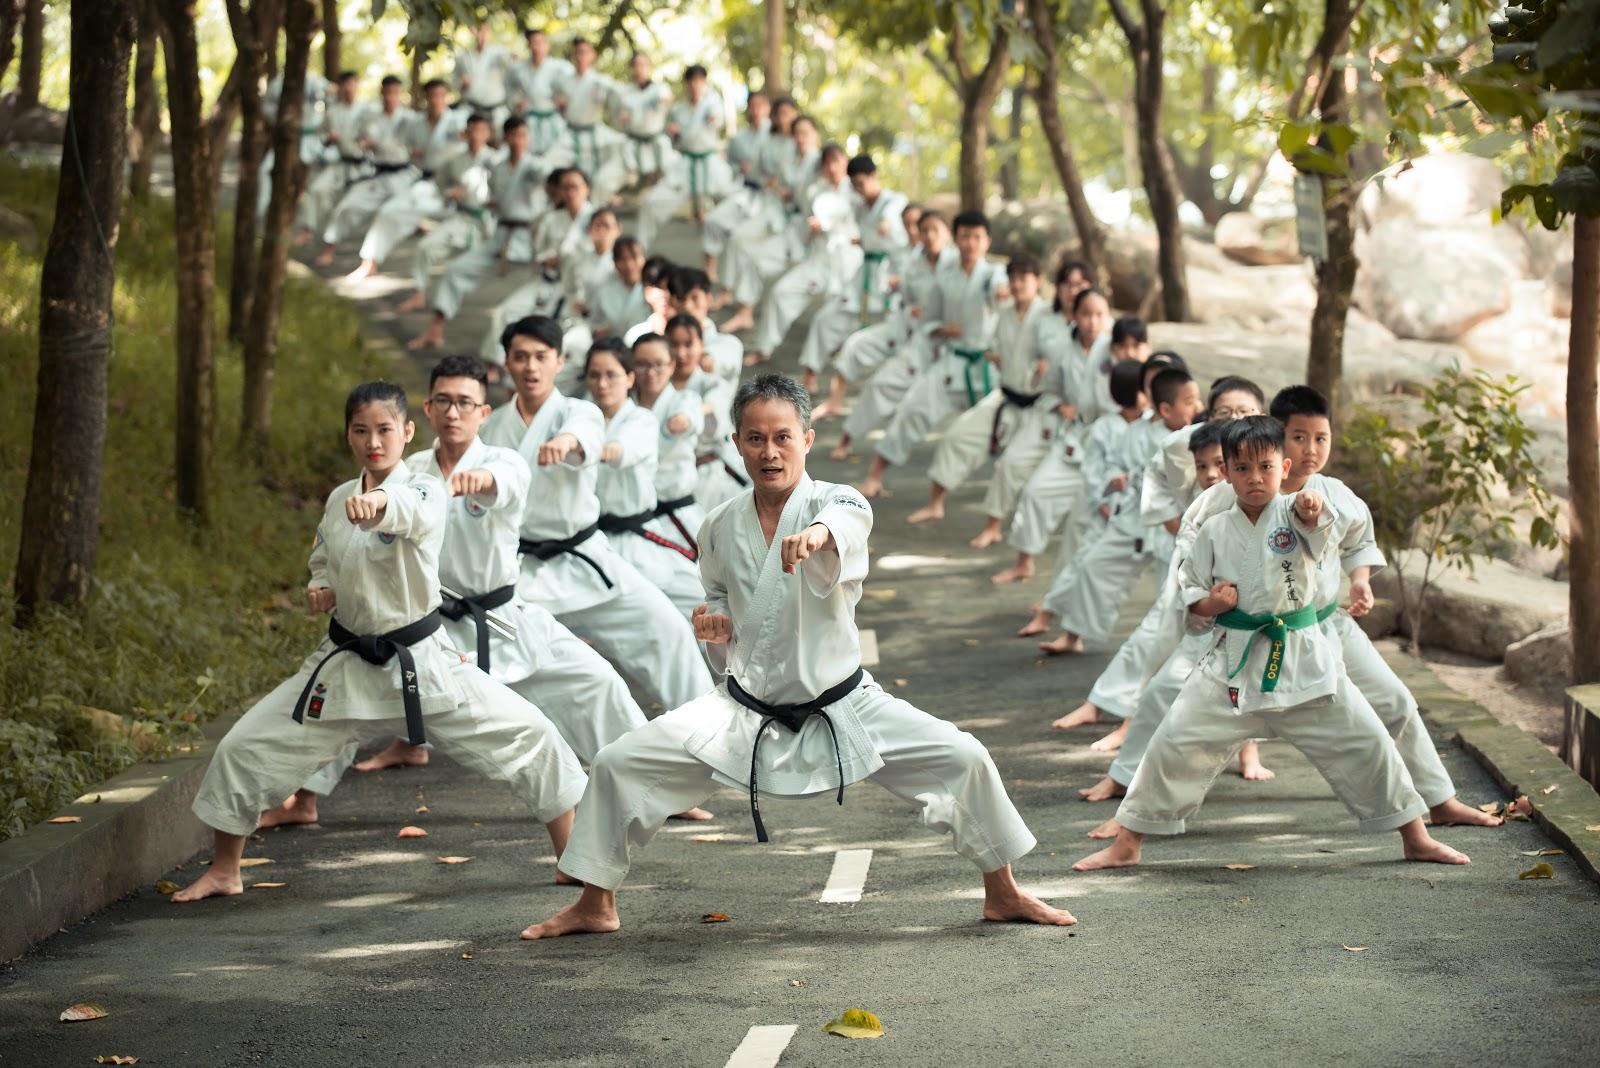 Karate Stance - Sumo Stance - Shiko Dachi